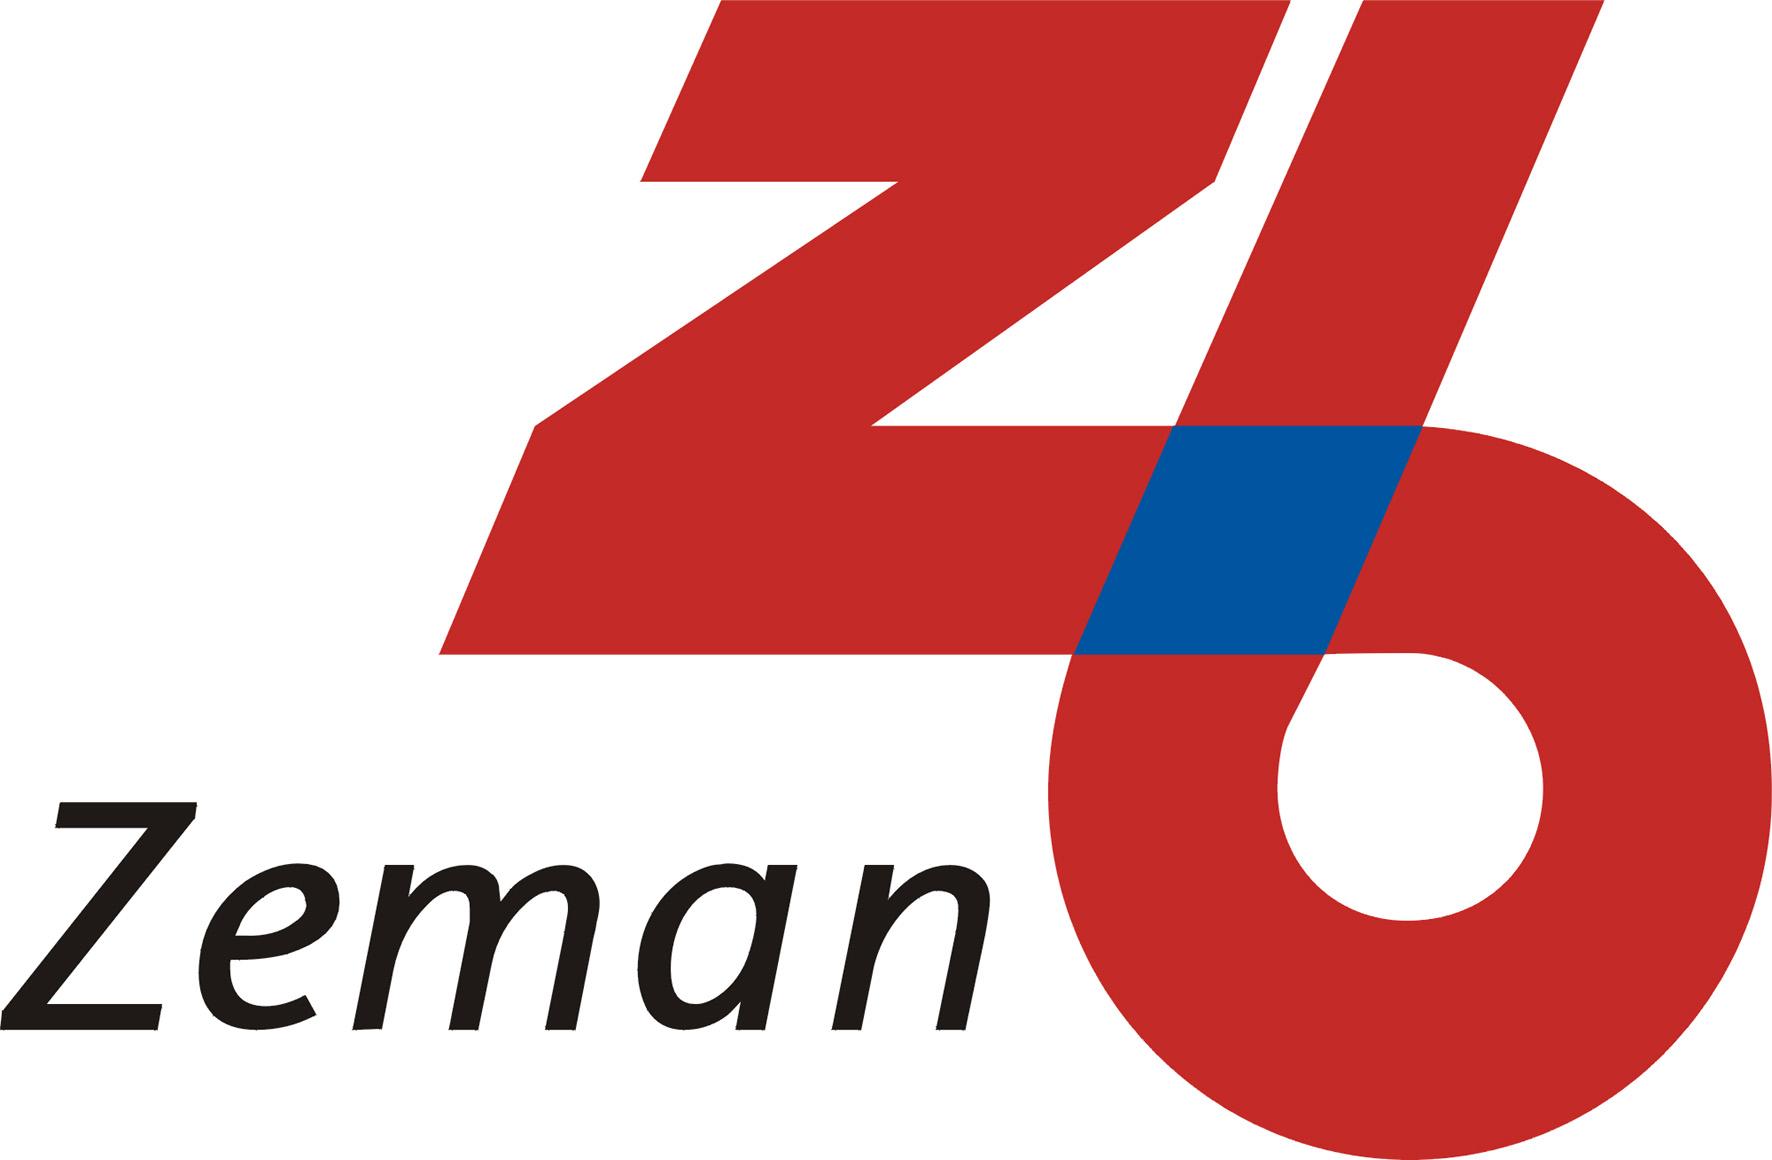 zeman logo